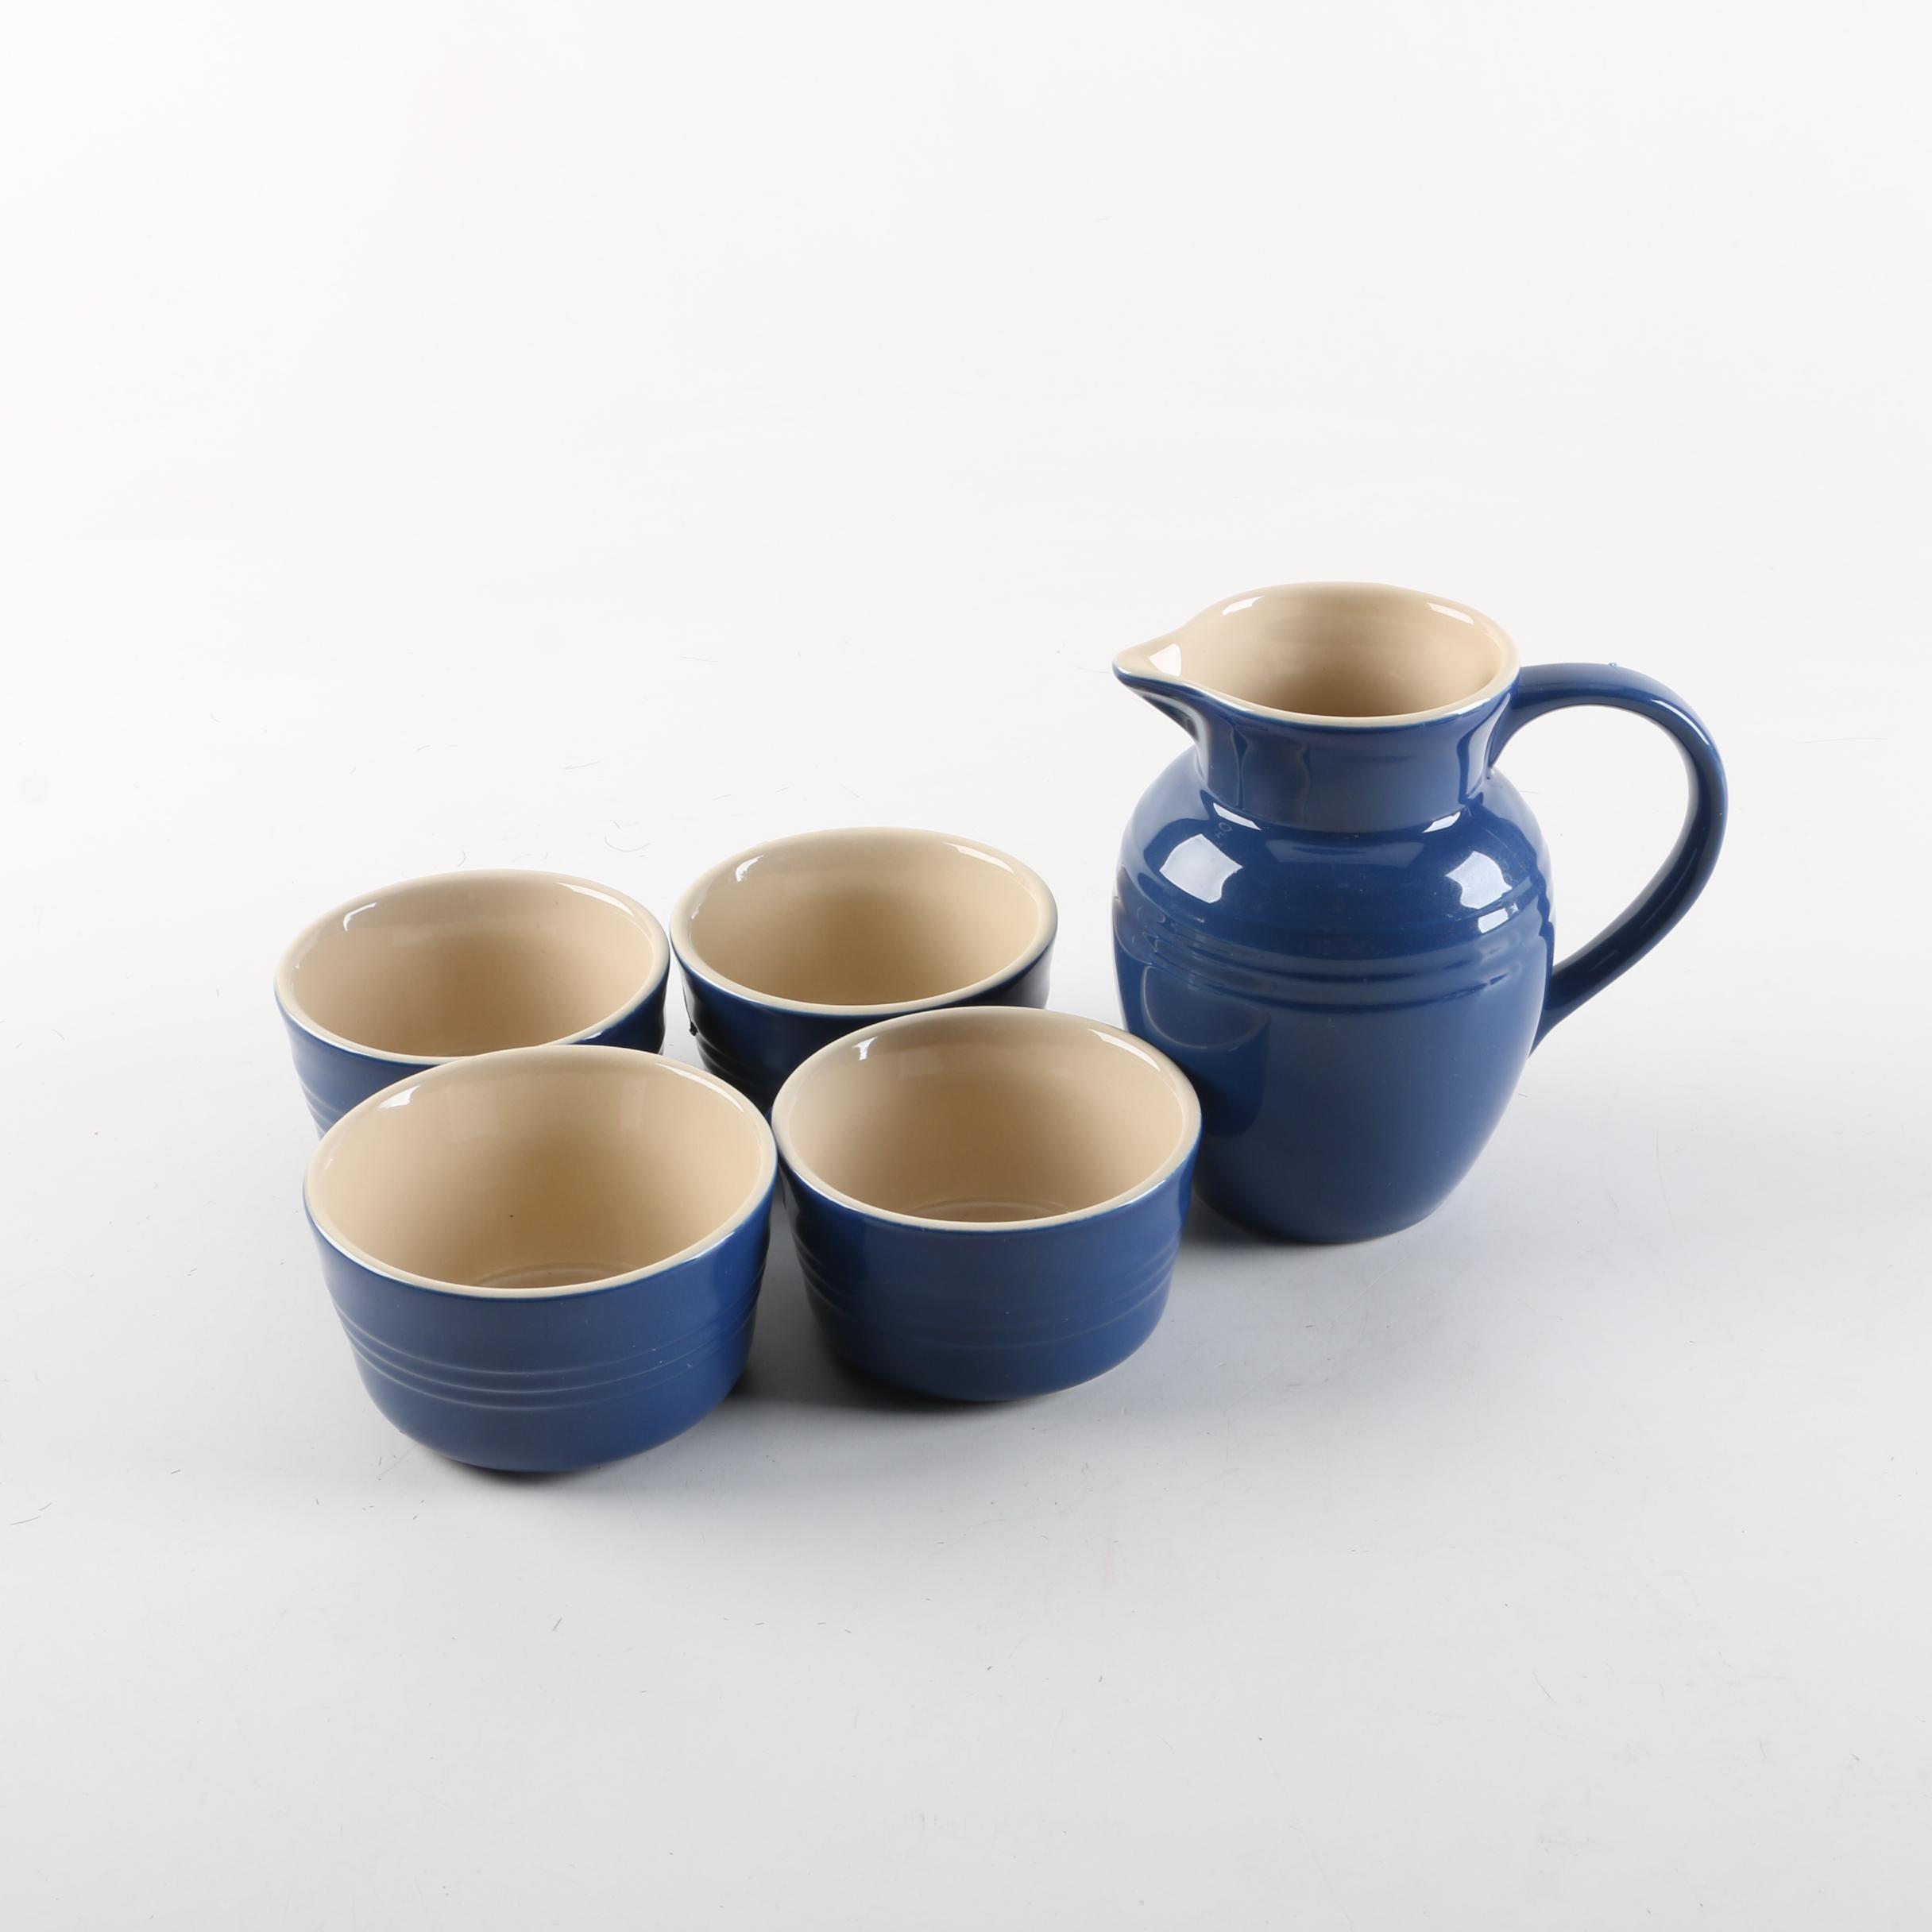 "Le Creuset ""Indigo"" Stoneware Tableware"